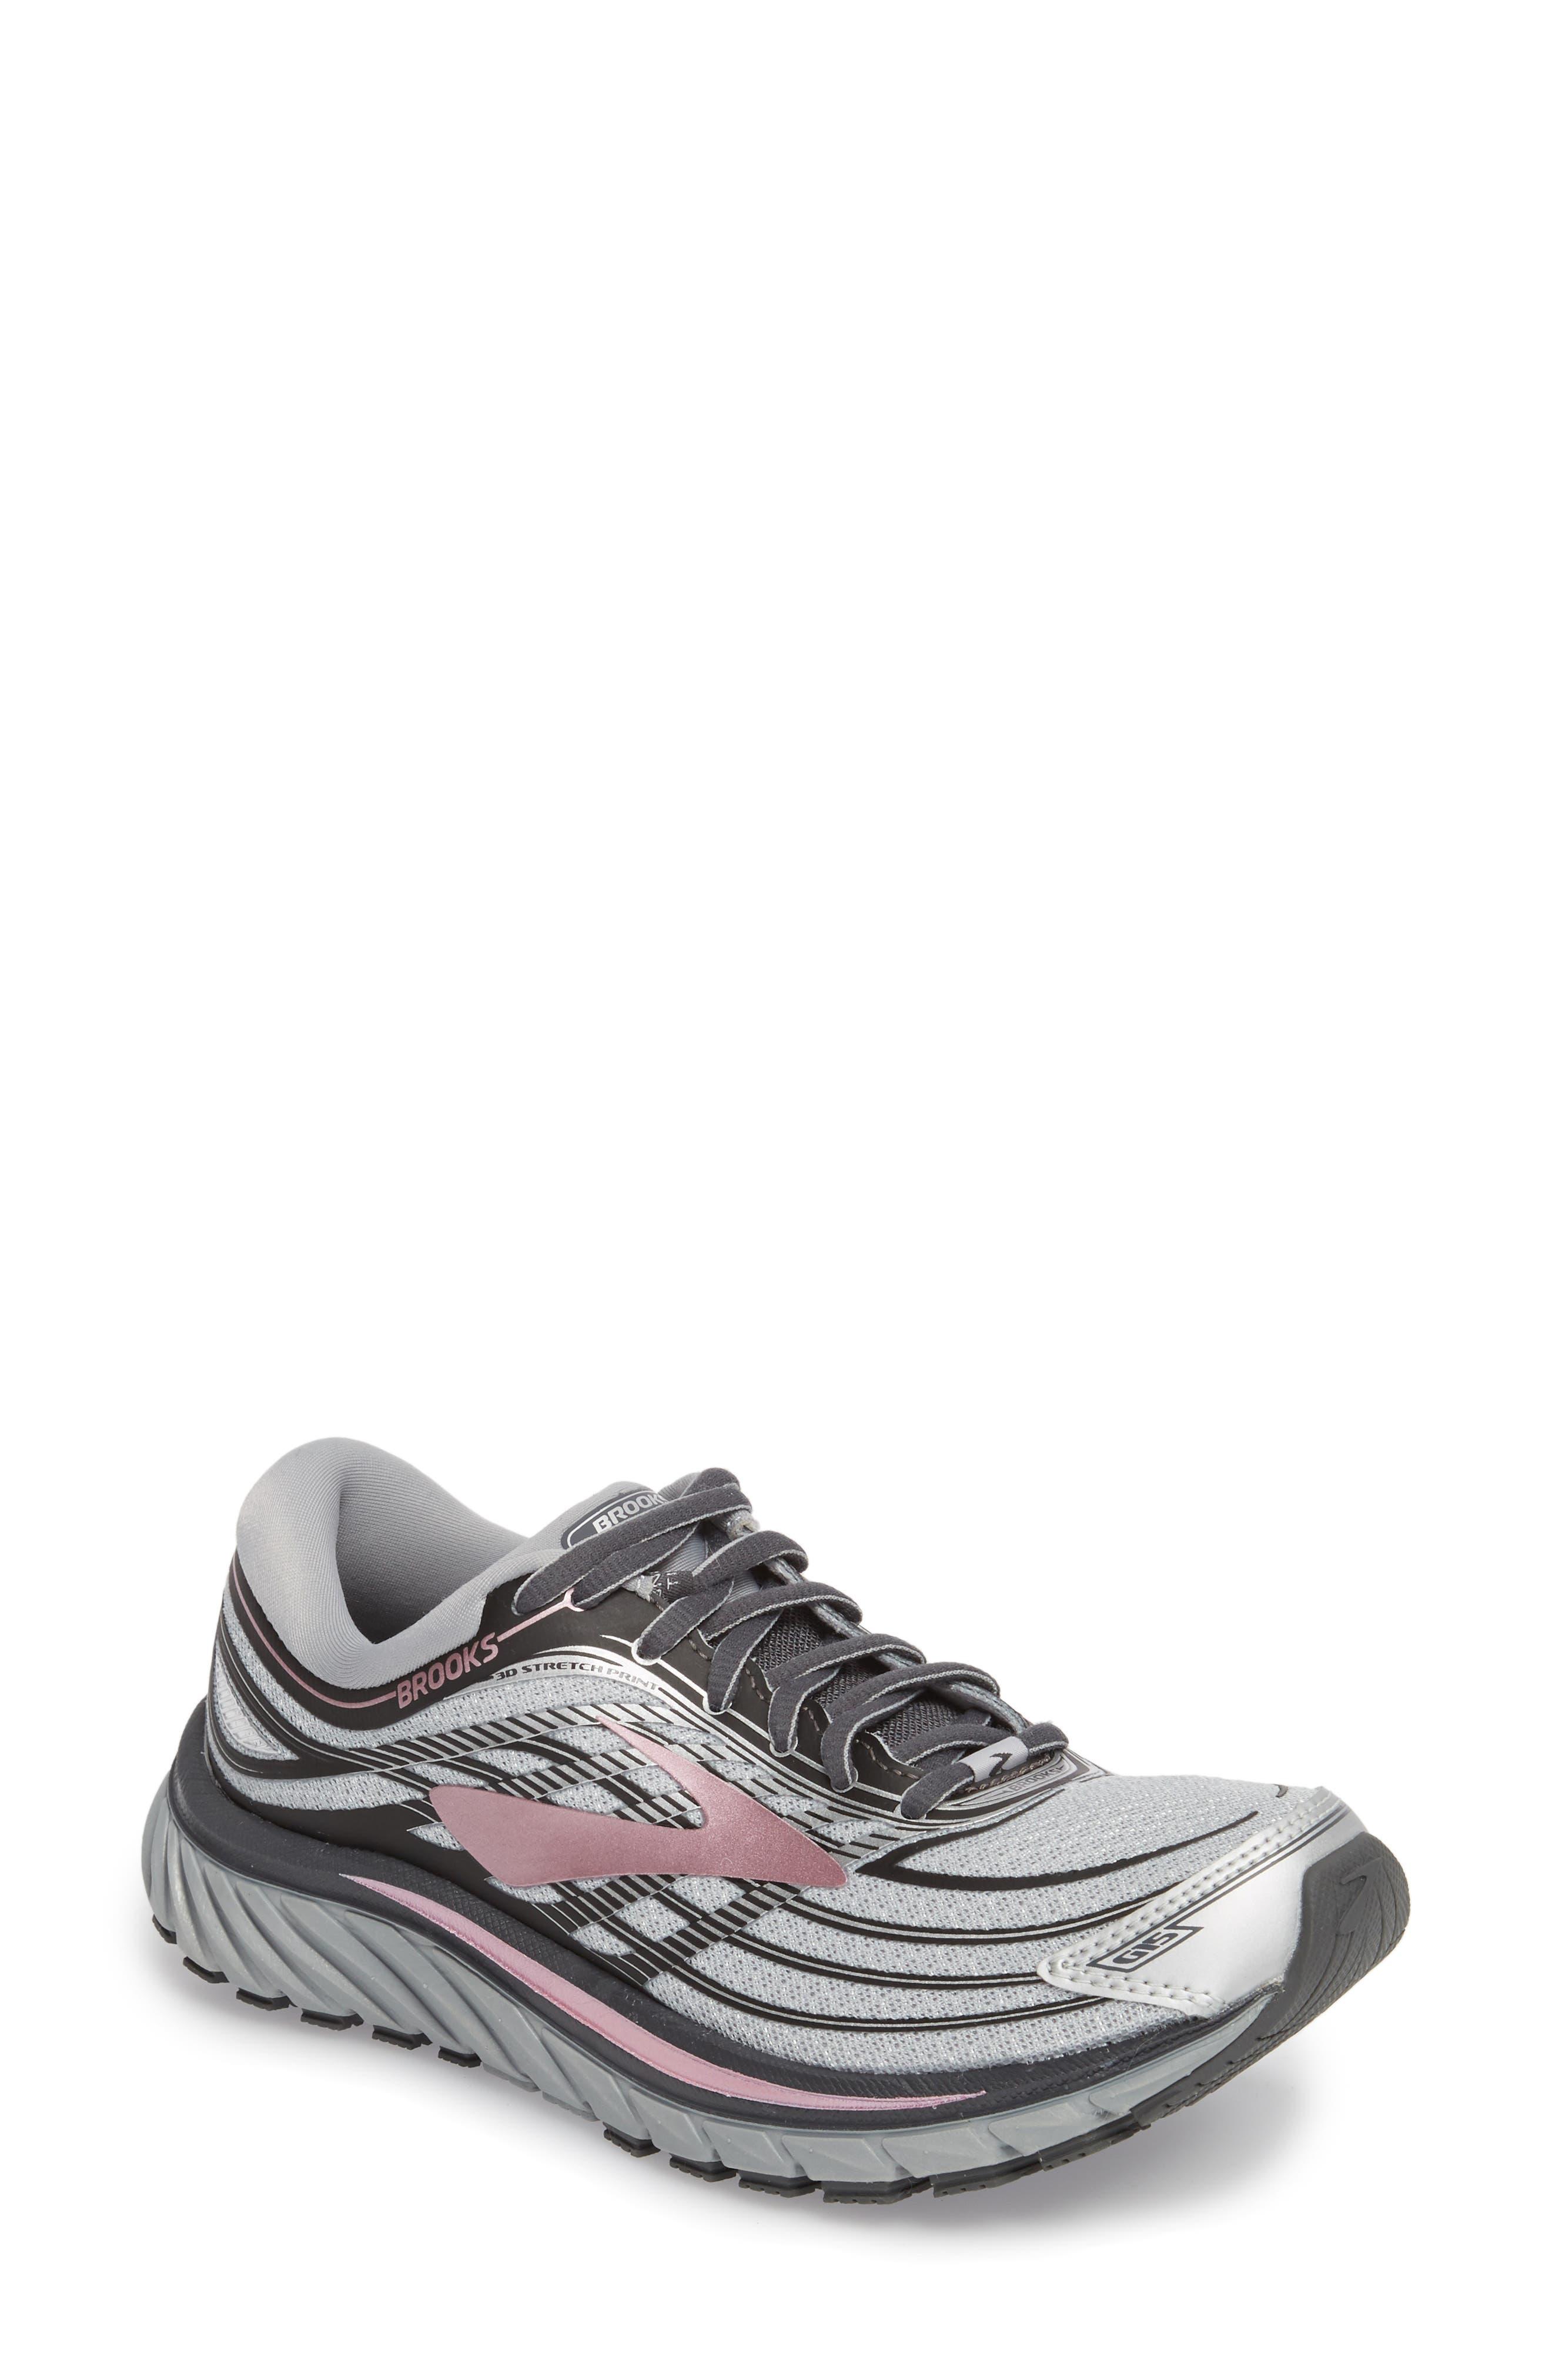 Glycerin 15 Running Shoe,                         Main,                         color, 057